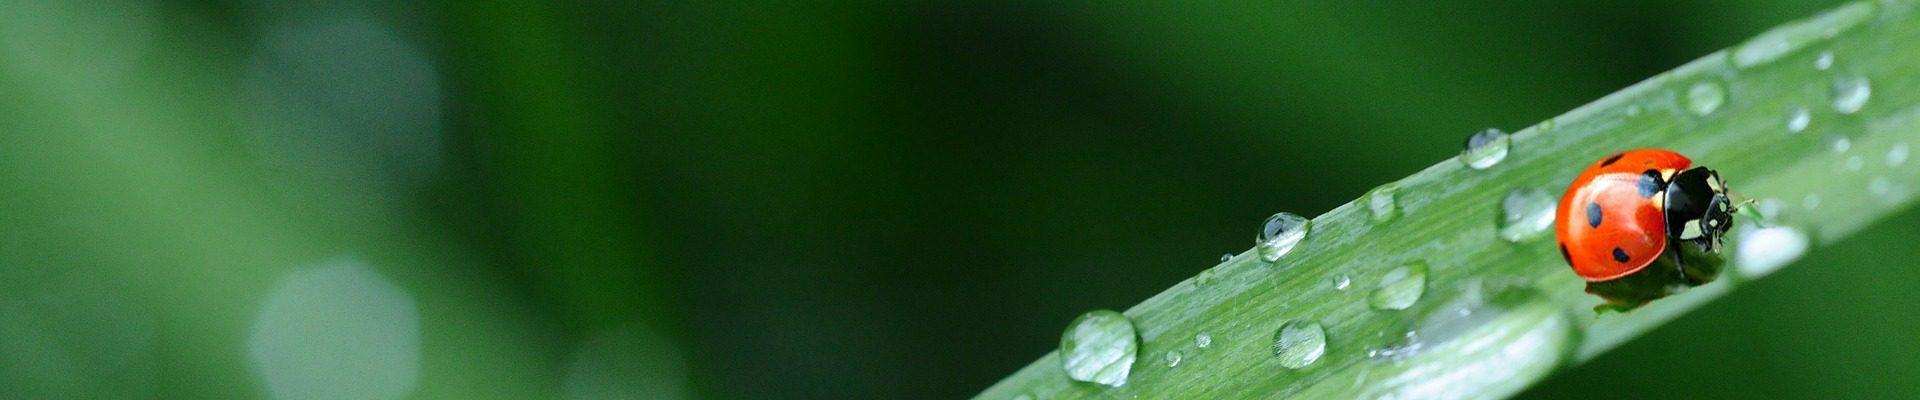 Catégorie: Jardin des lutins verts